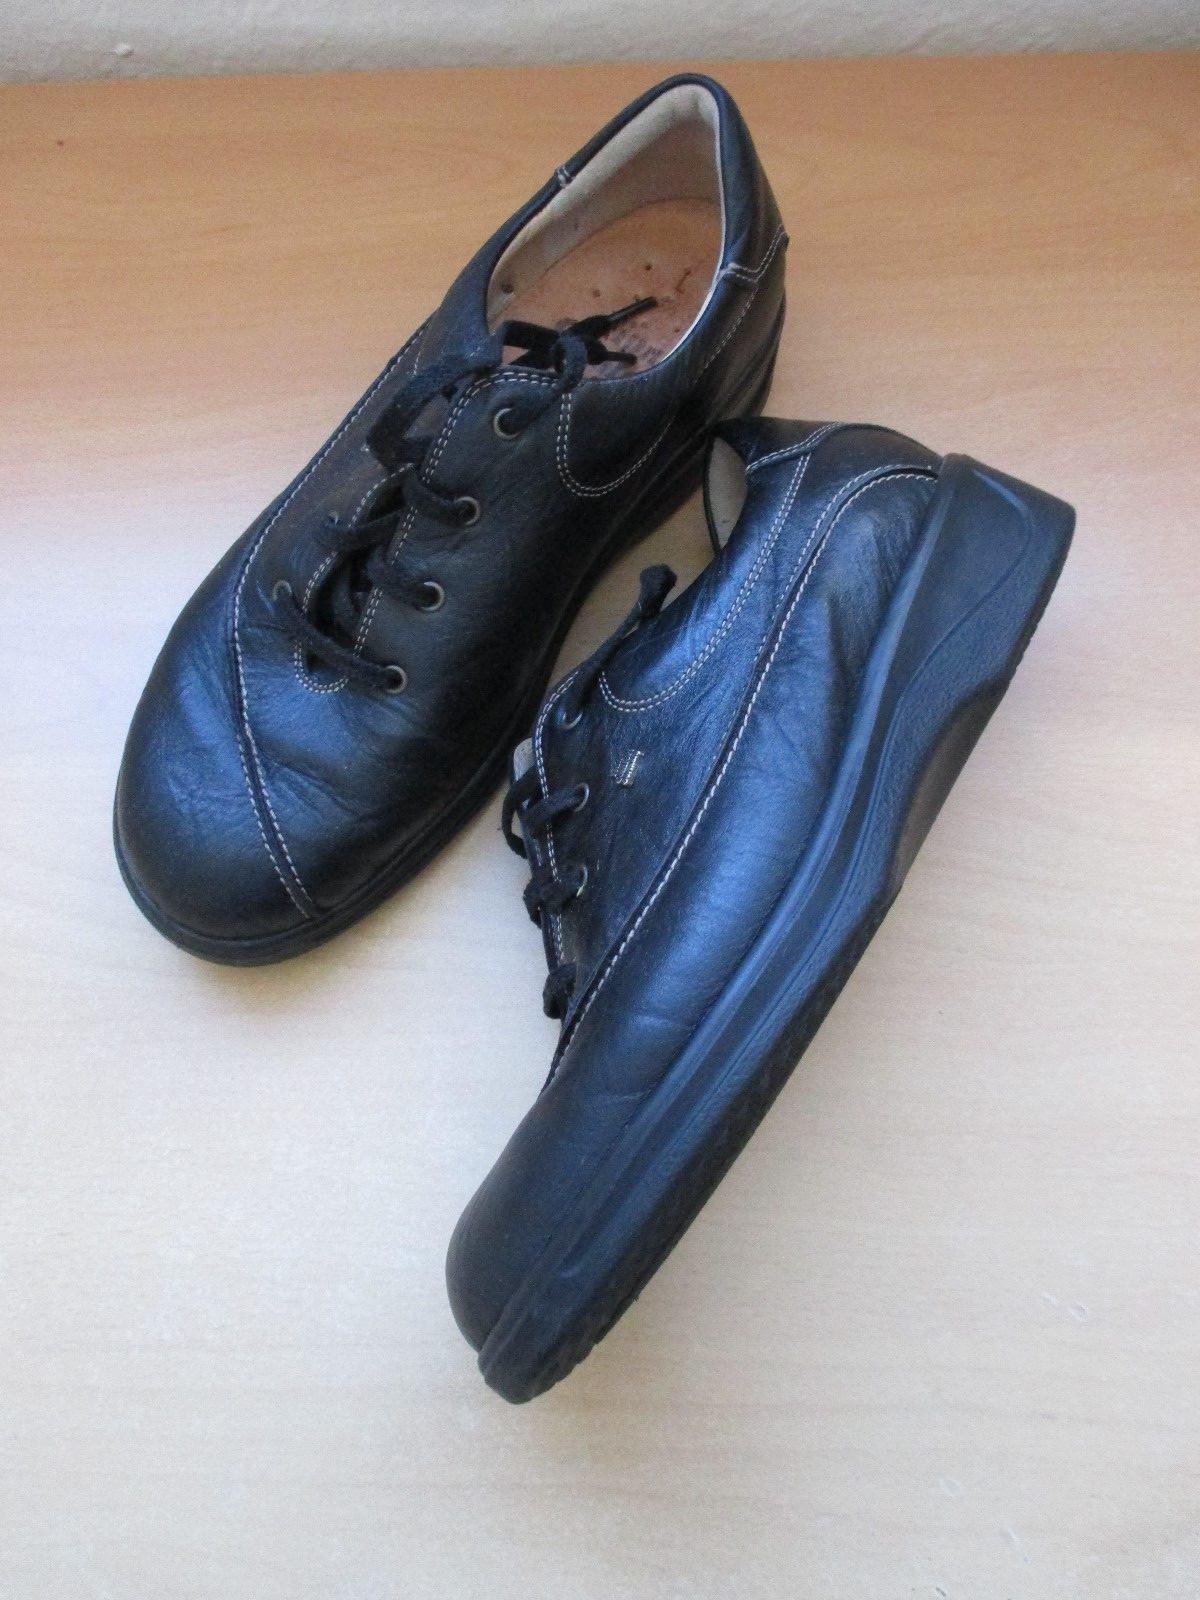 Moda barata y hermosa Descuento por tiempo limitado Finn Comfort Damen Schuhe 5,5-38,5 L schwarz Schnürschuhe Loafer/A